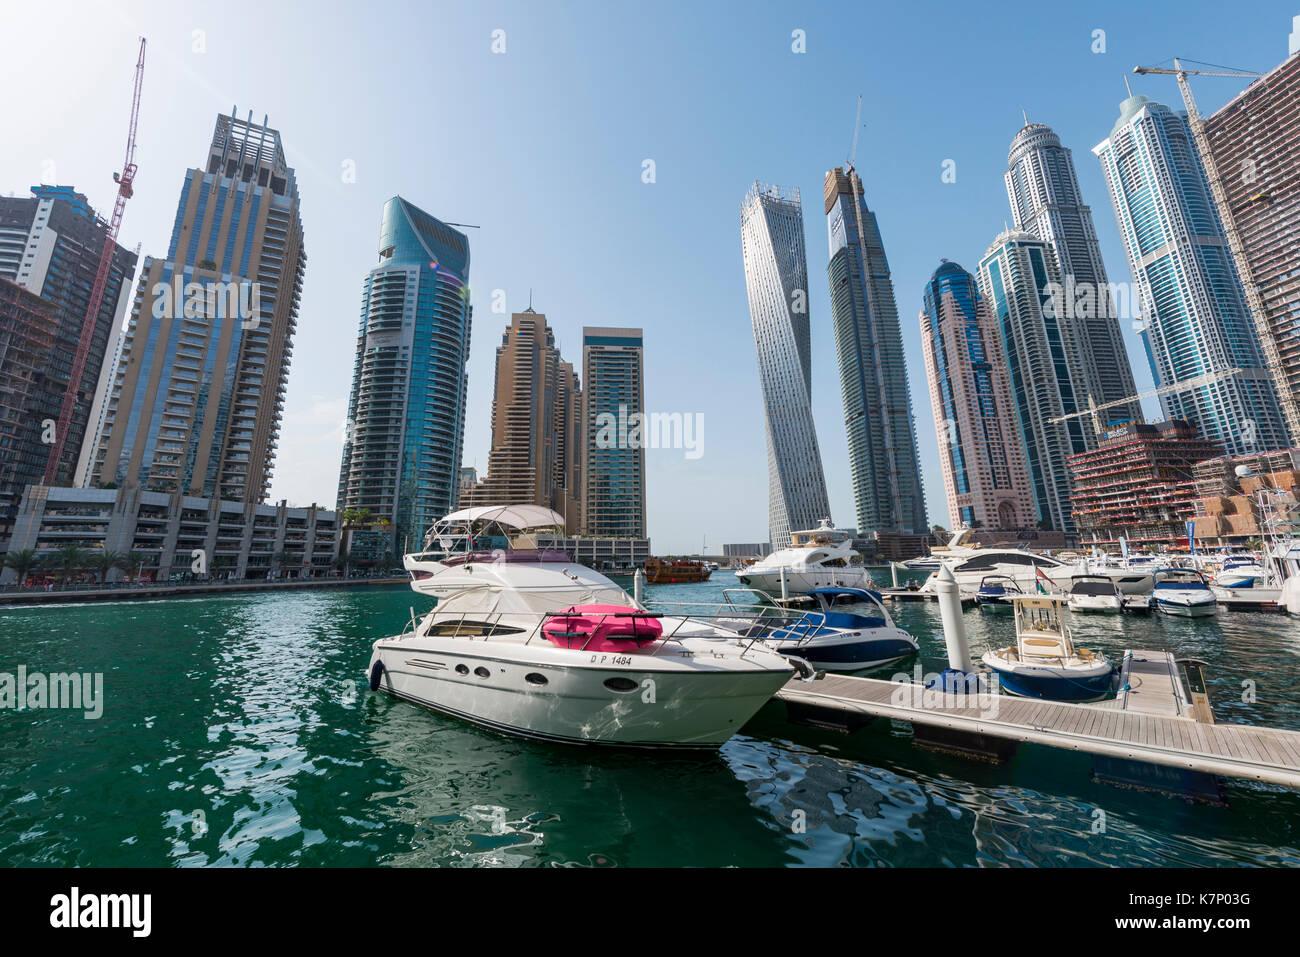 Marina in front of skyscrapers, Dubai Marina, Dubai, United Arab Emirates - Stock Image